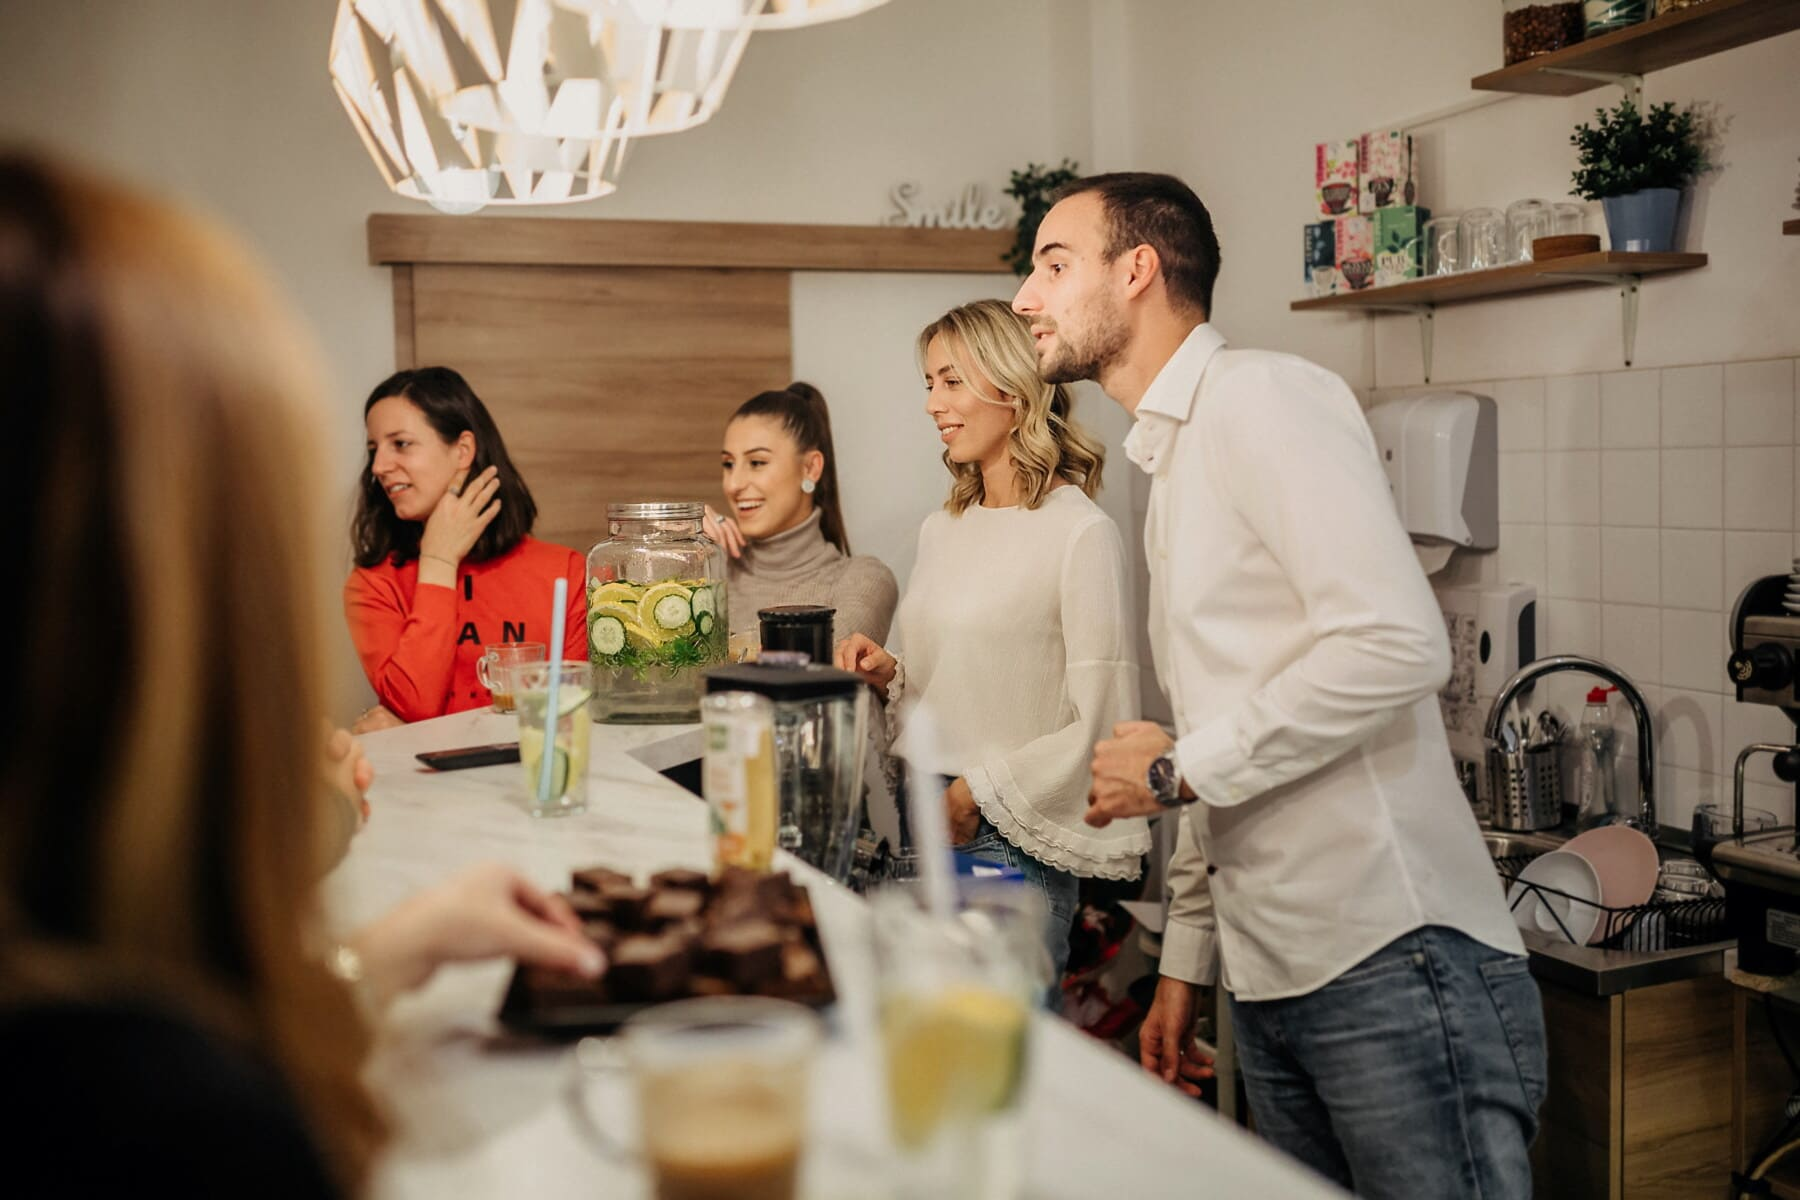 Besprechung, Kuchenladen, Genuss, Cafeteria, Barmann, junge Frau, Krämer, hübsches mädchen, Kunden, Frau